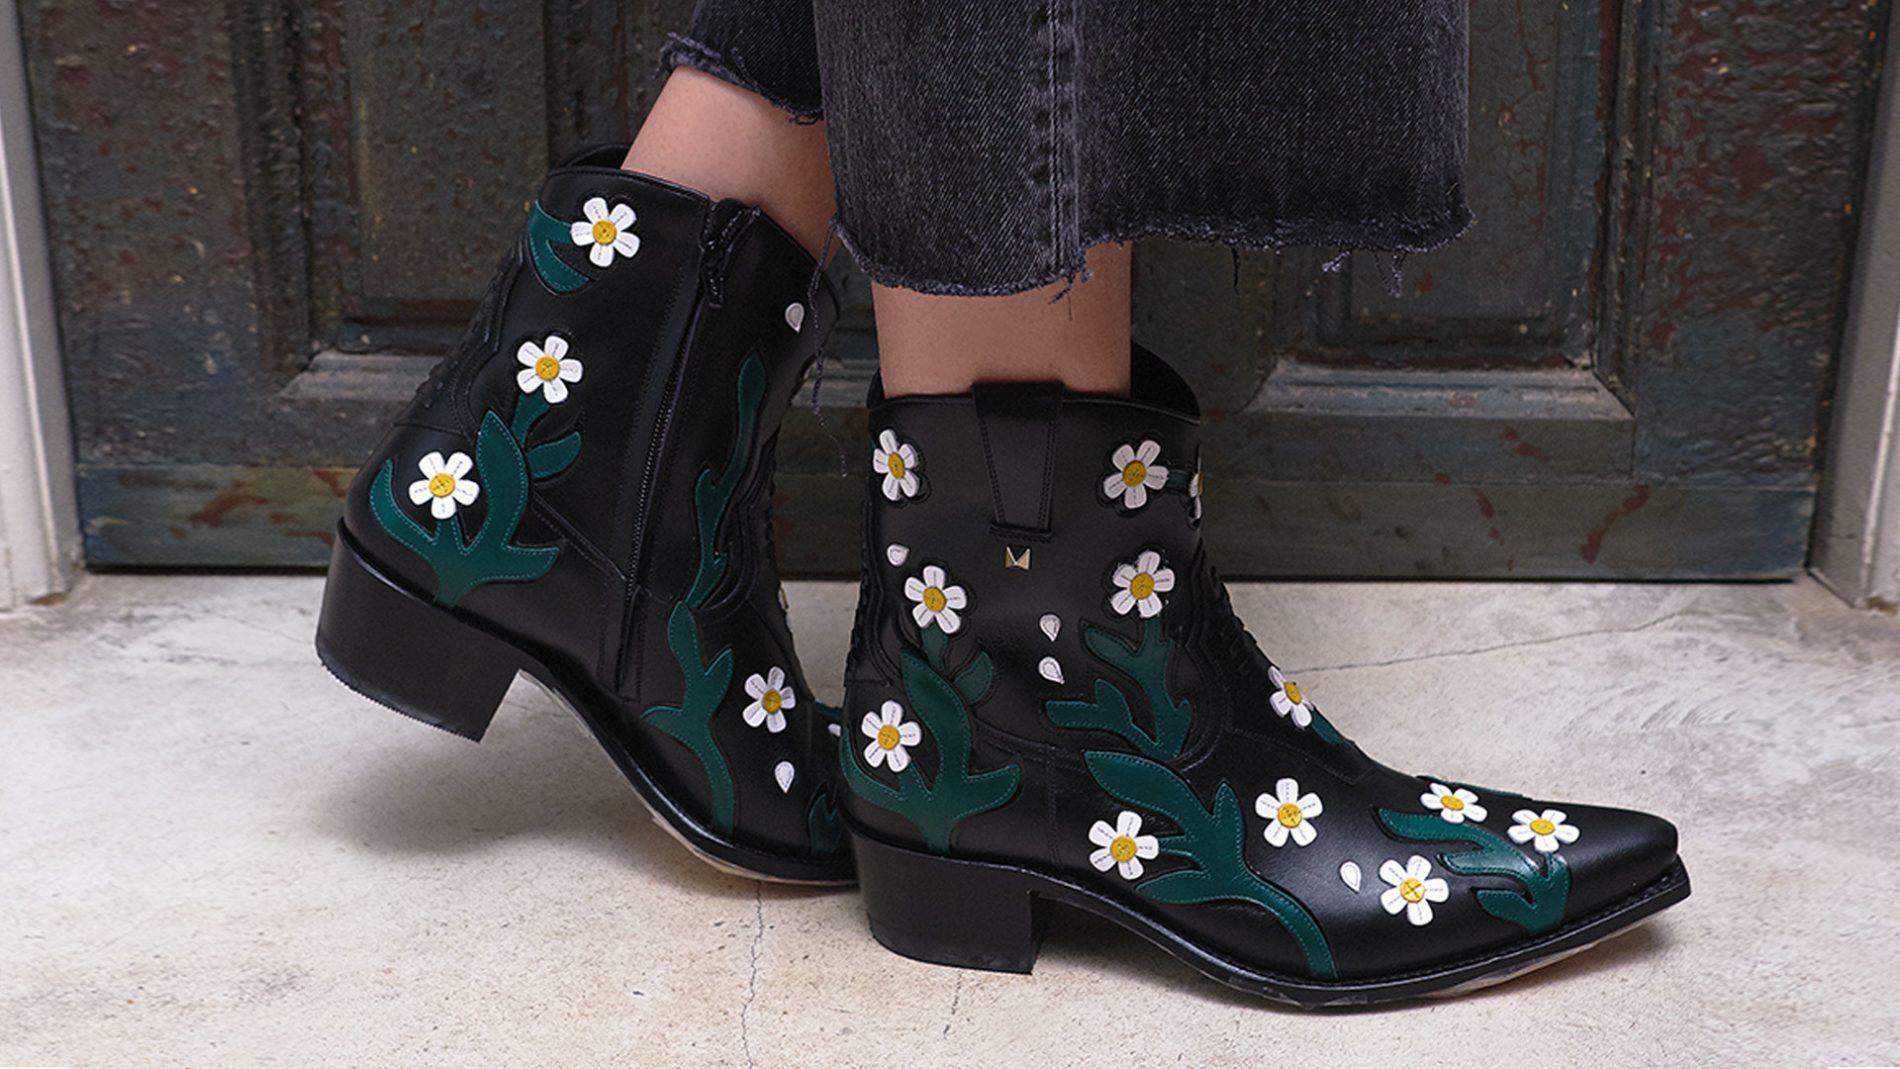 El Corte Inglés El Corte Inglés Designer Shoes Valentino Boots